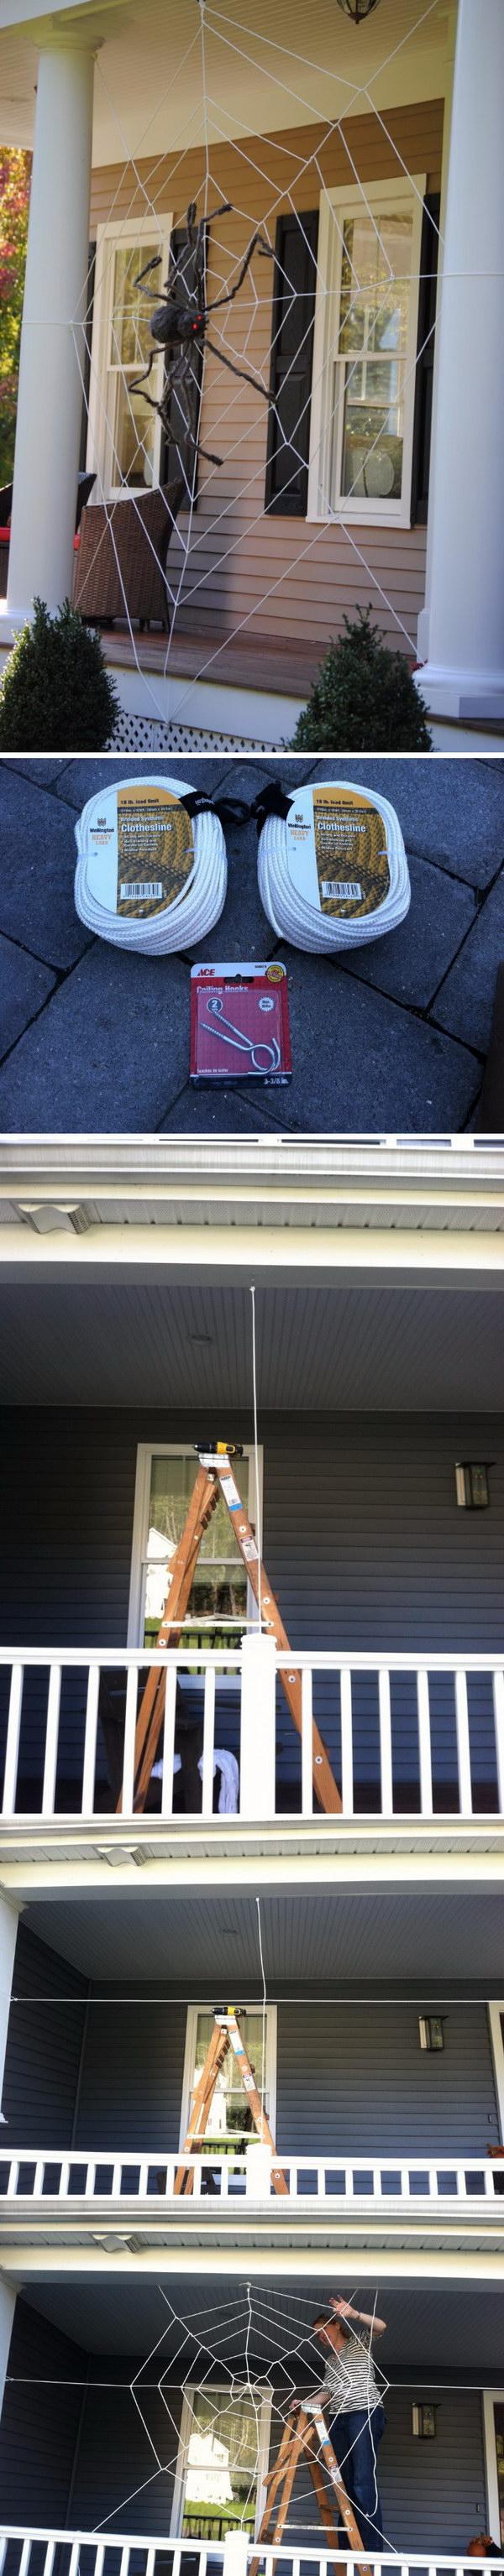 DIY Tangled Spider Web.